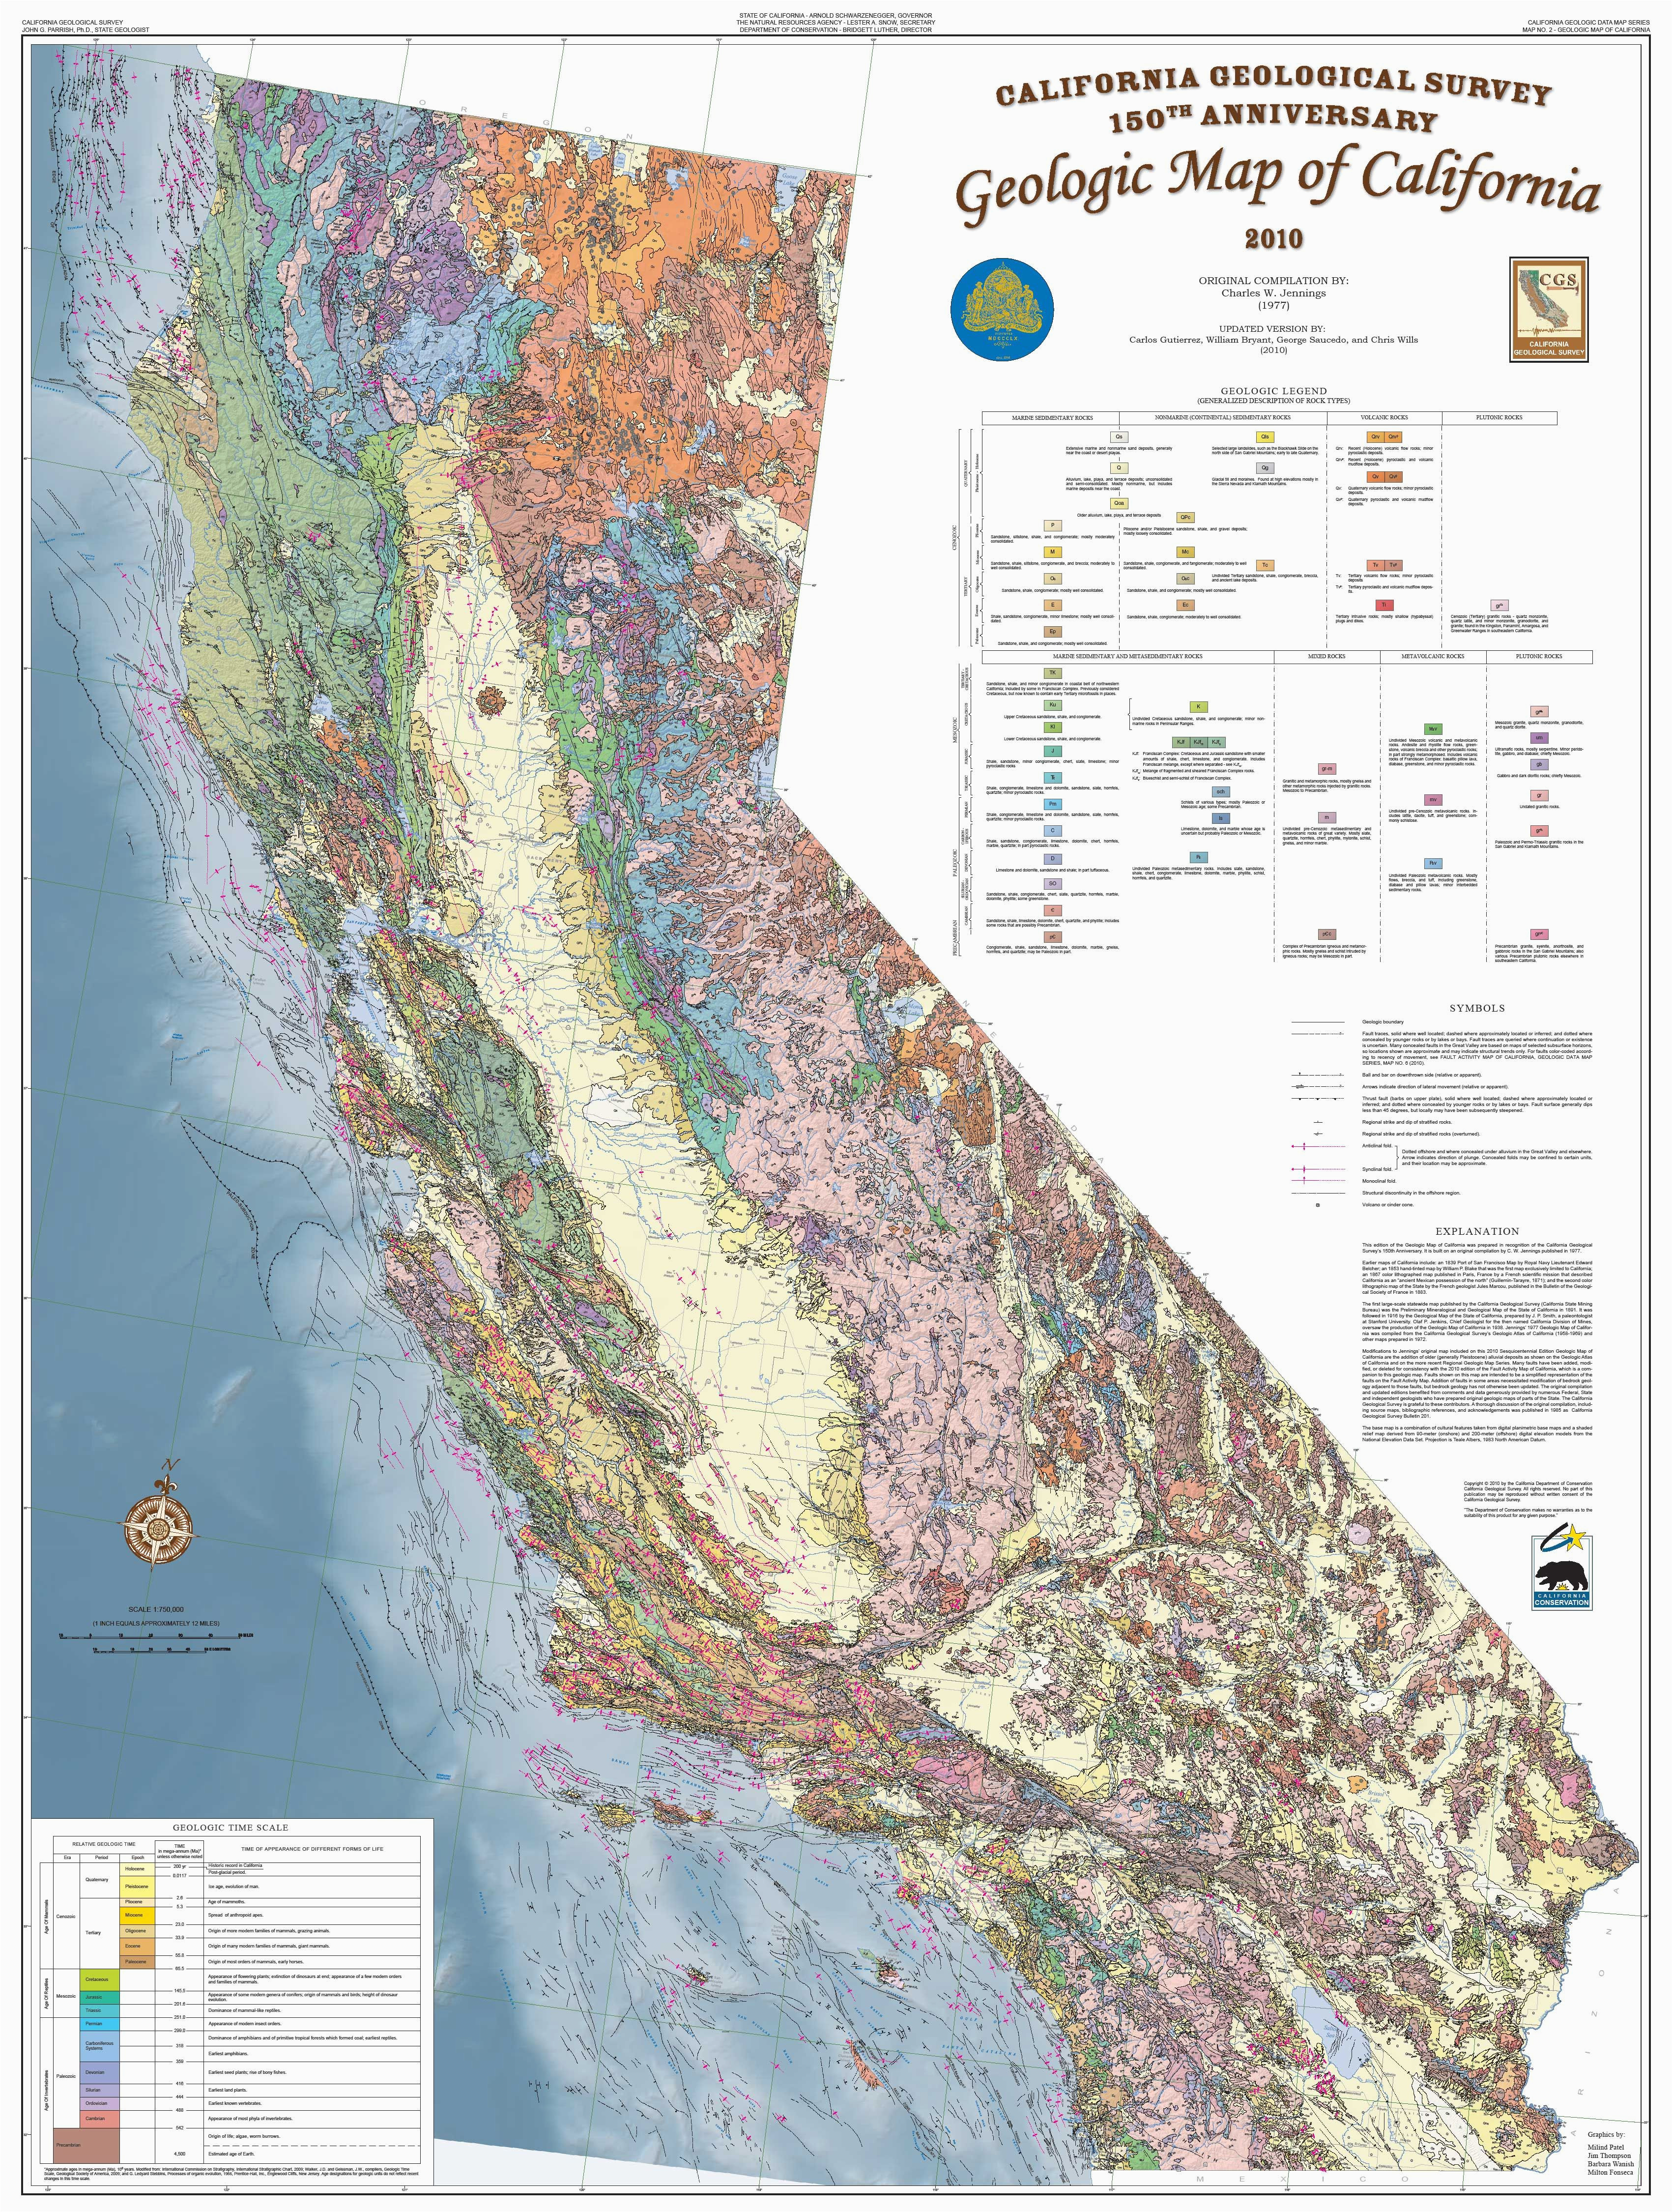 california geological survey 2010 state geologic map of california